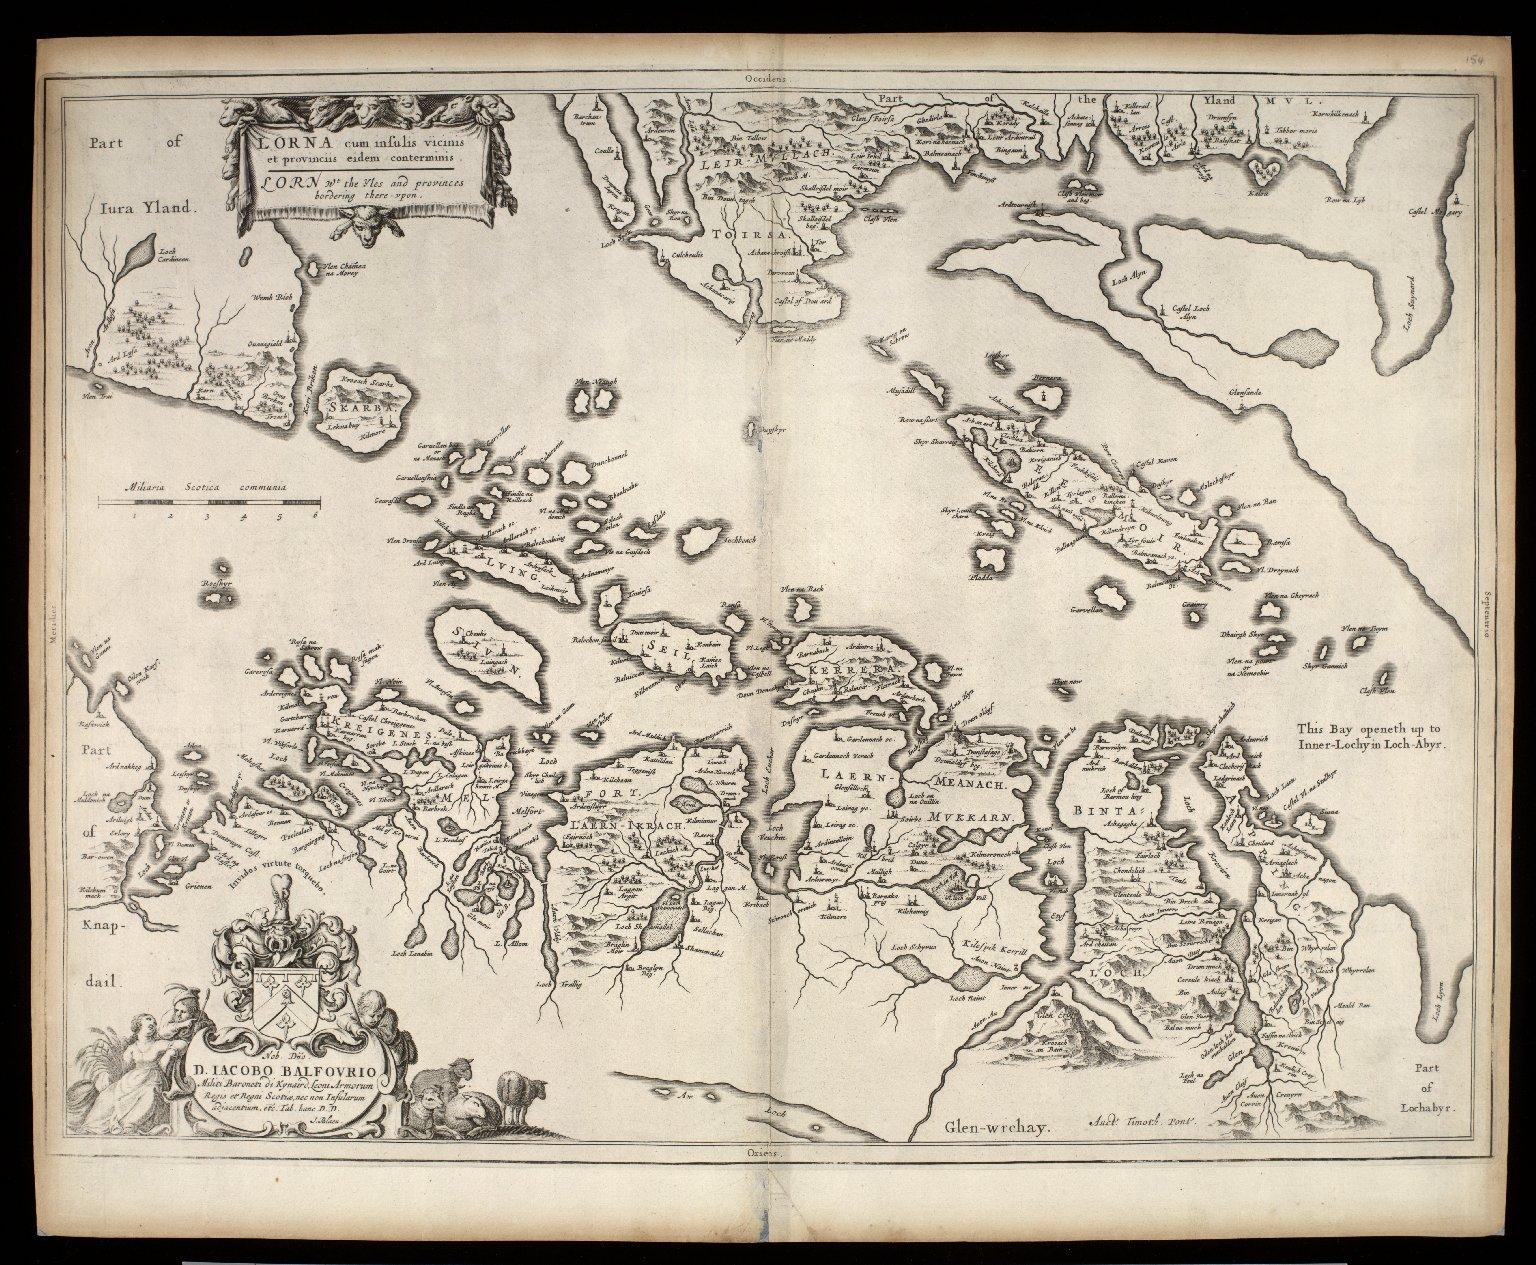 Lorna cum insulis vicinis et provinciis eidem conterminis = Lorn wt the Yles and provinces bordering there-upon [1 of 1]